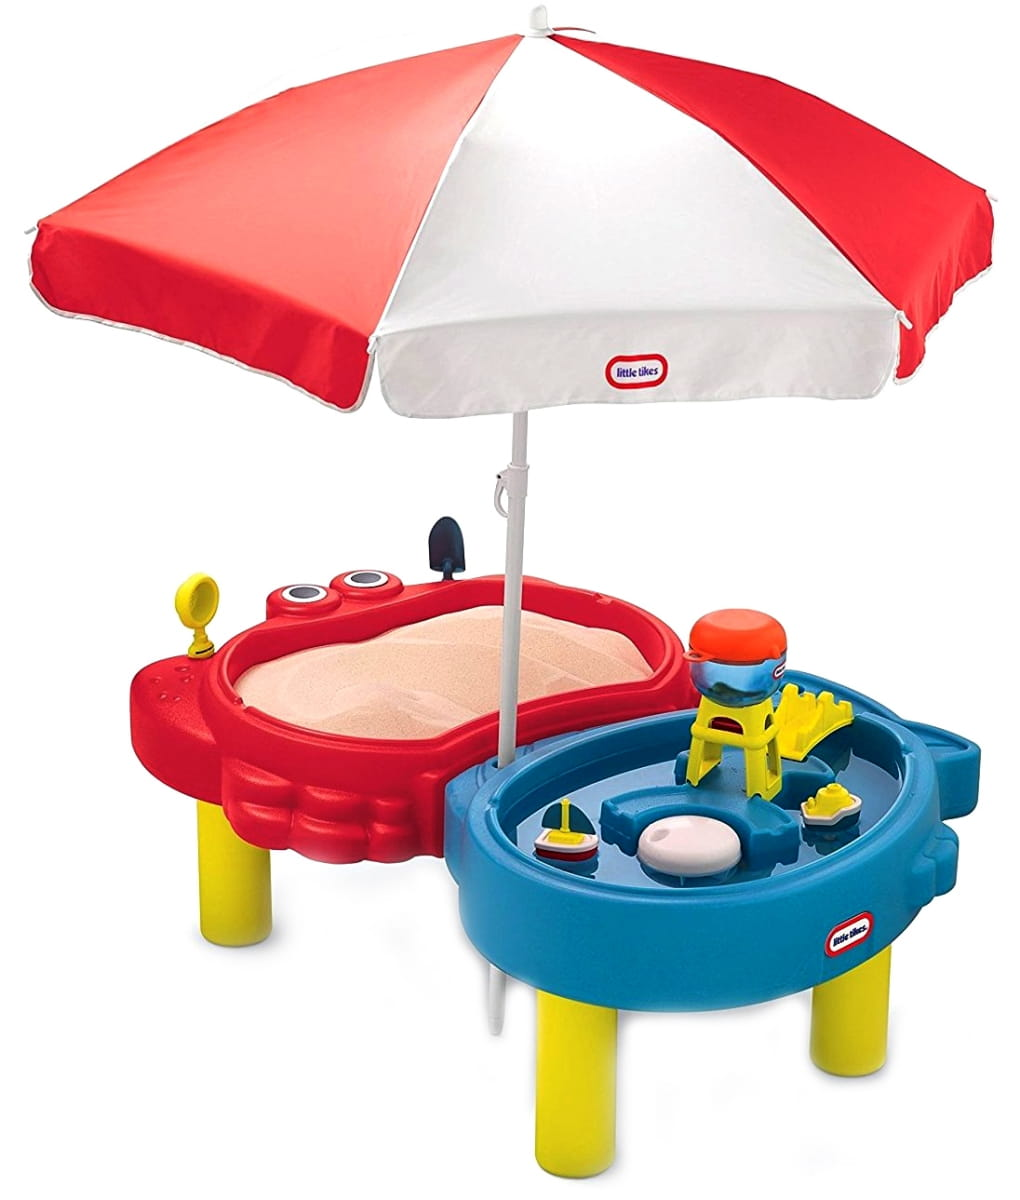 Стол-песочница Little Tikes с зонтиком